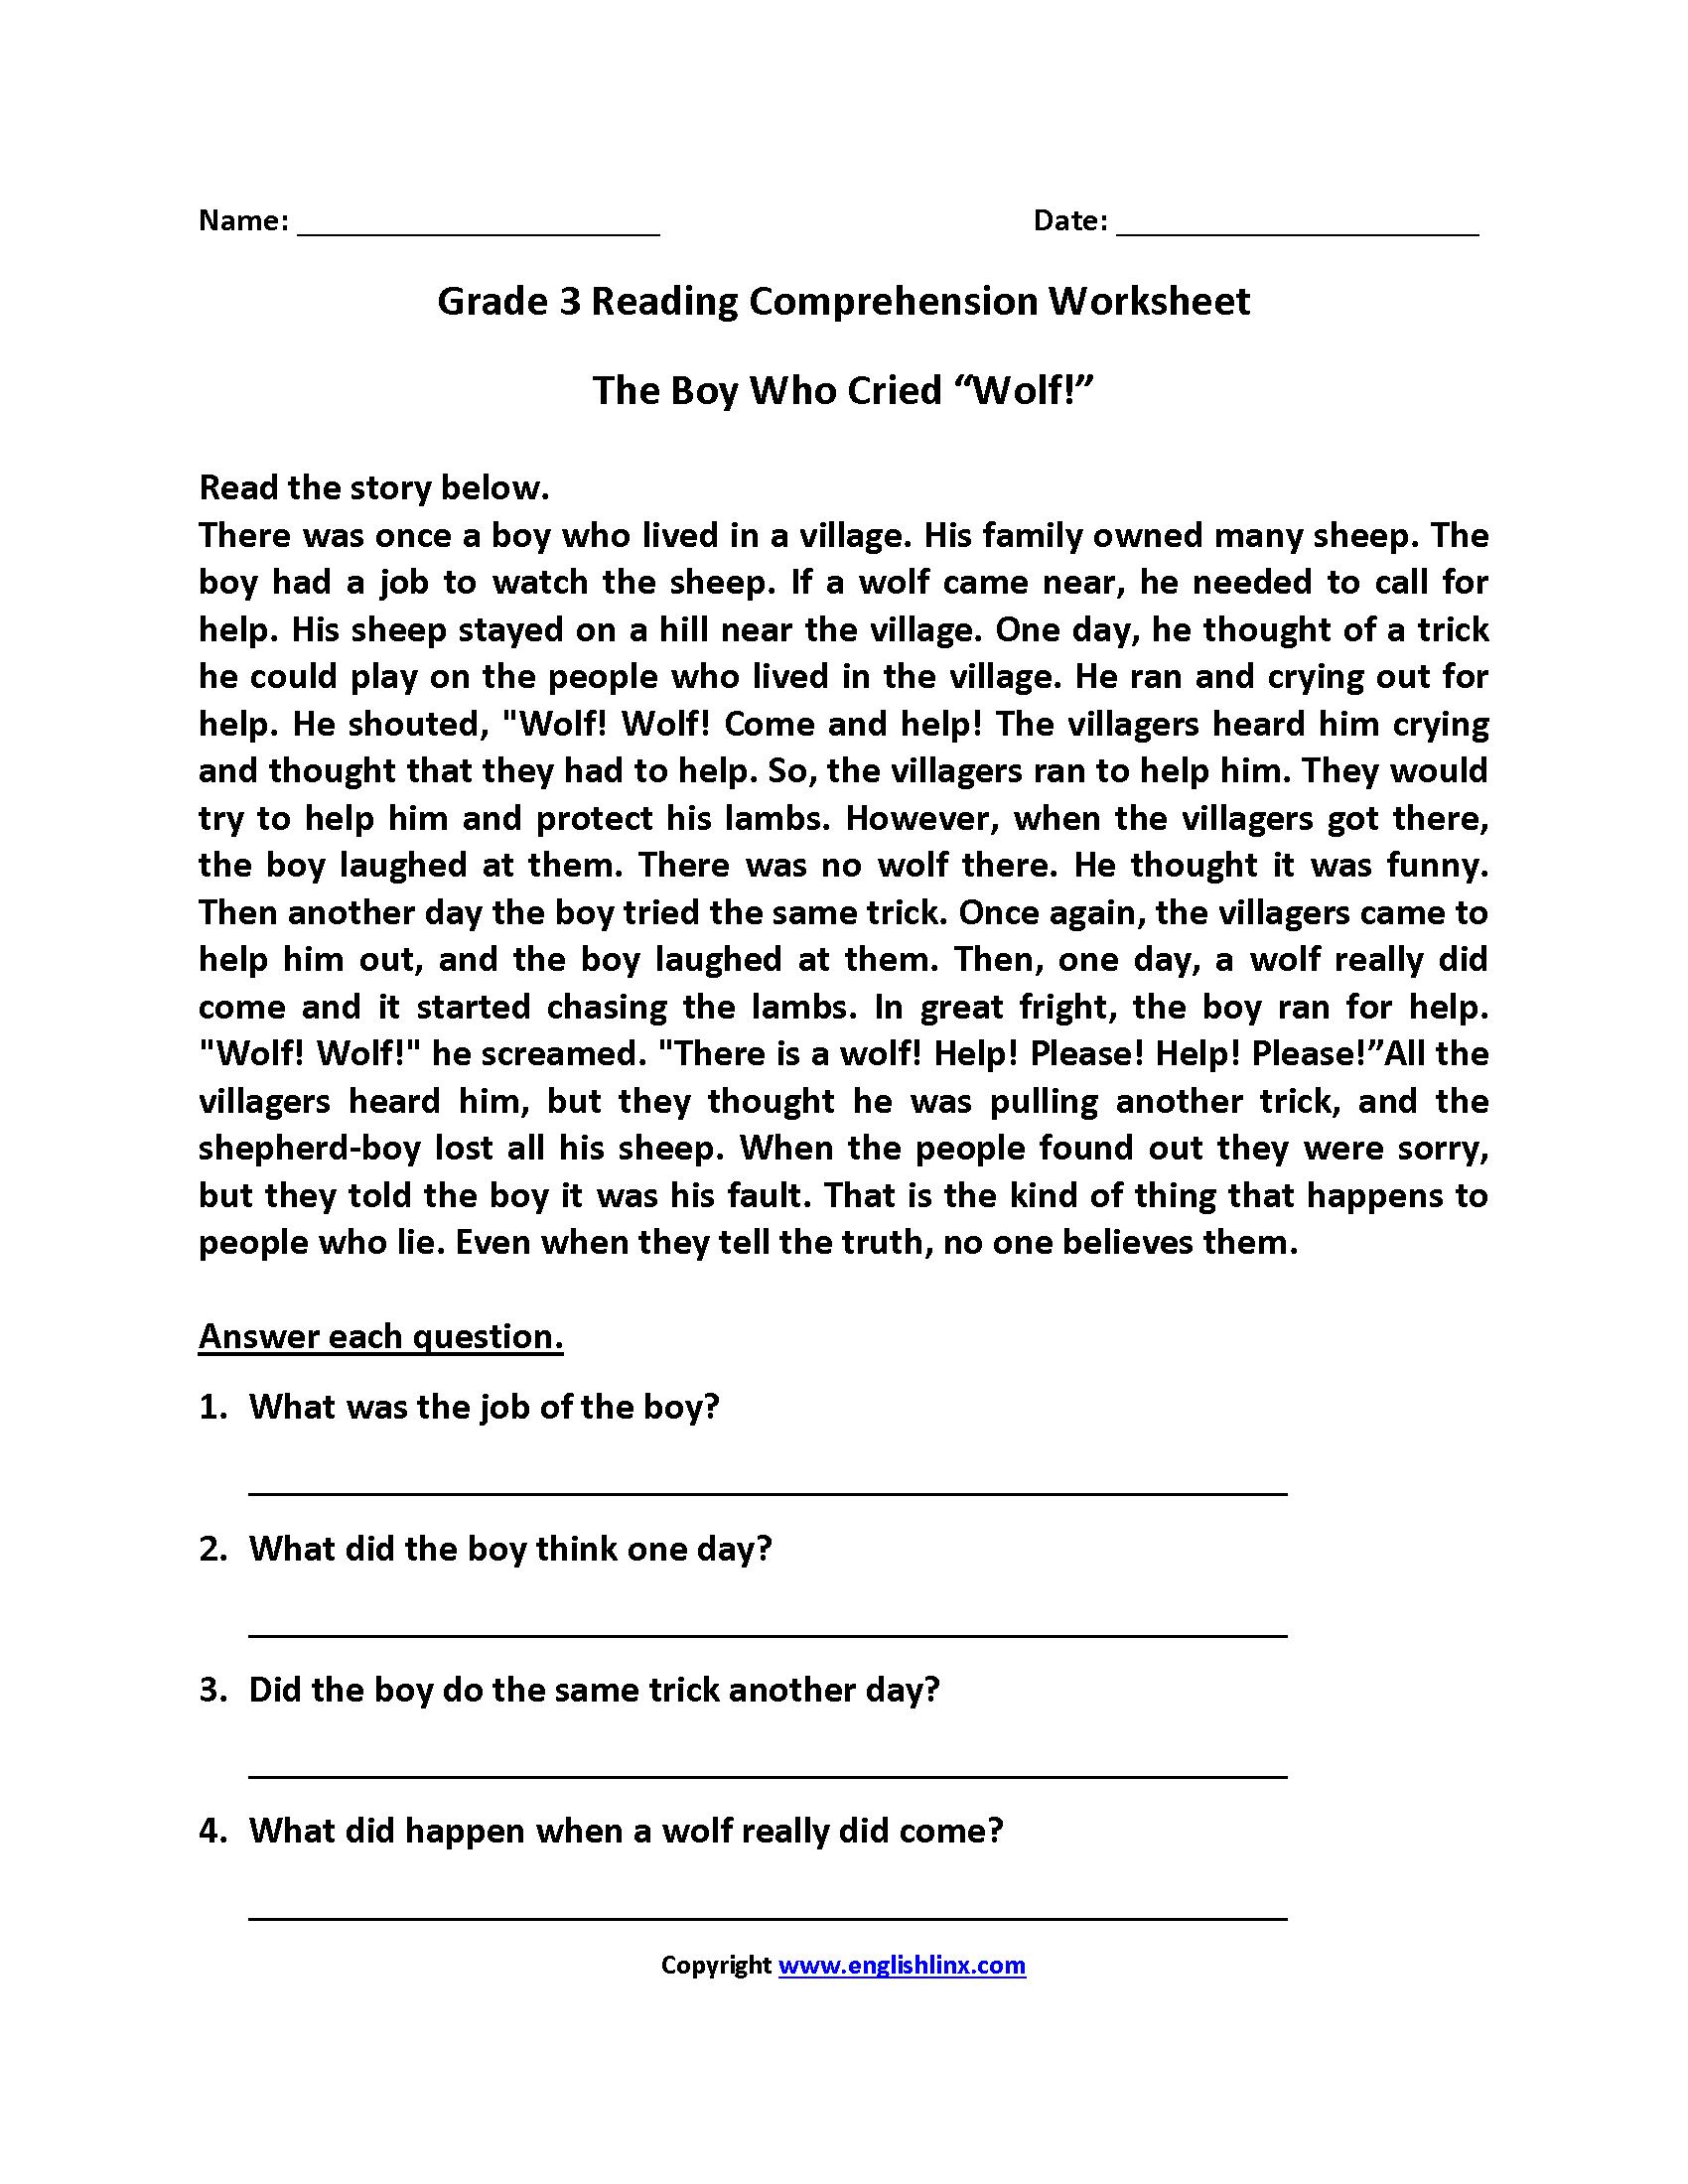 English Worksheets | Reading Worksheets - Third Grade Reading Worksheets Free Printable